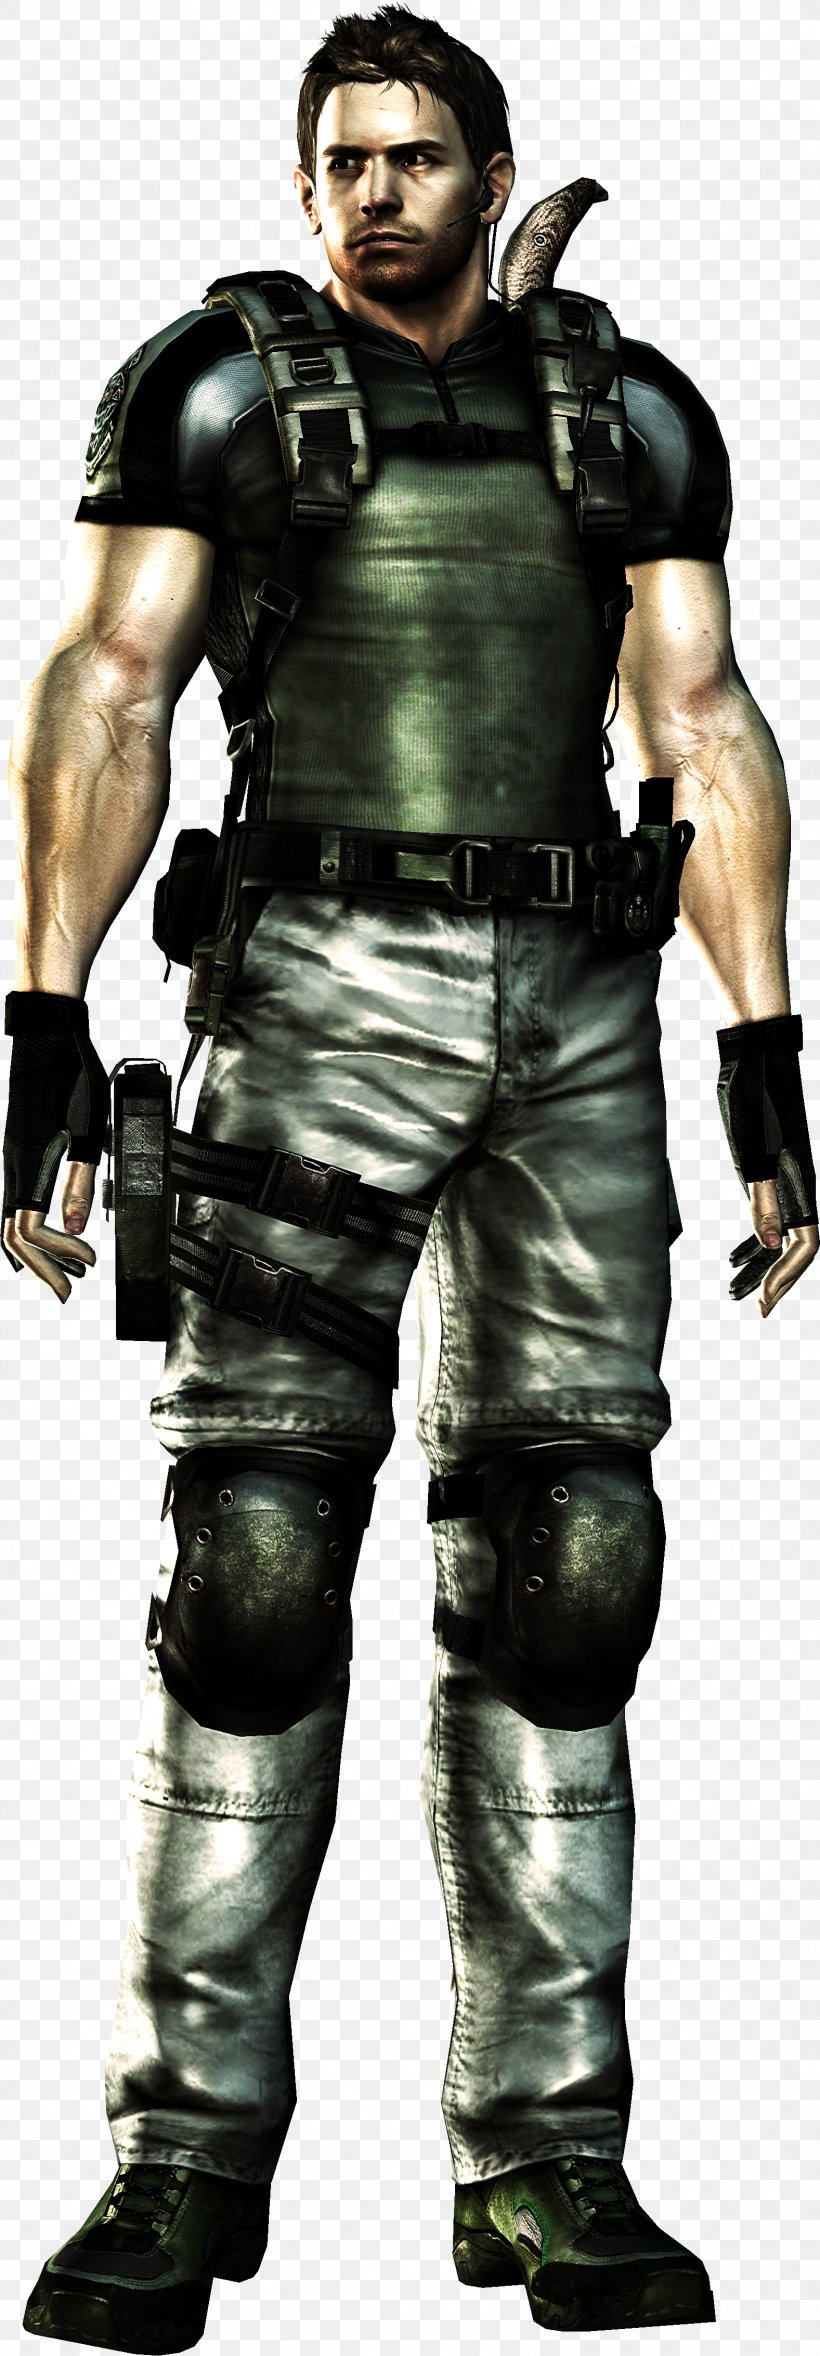 Resident Evil 5 Resident Evil 7 Biohazard Resident Evil 6 Chris